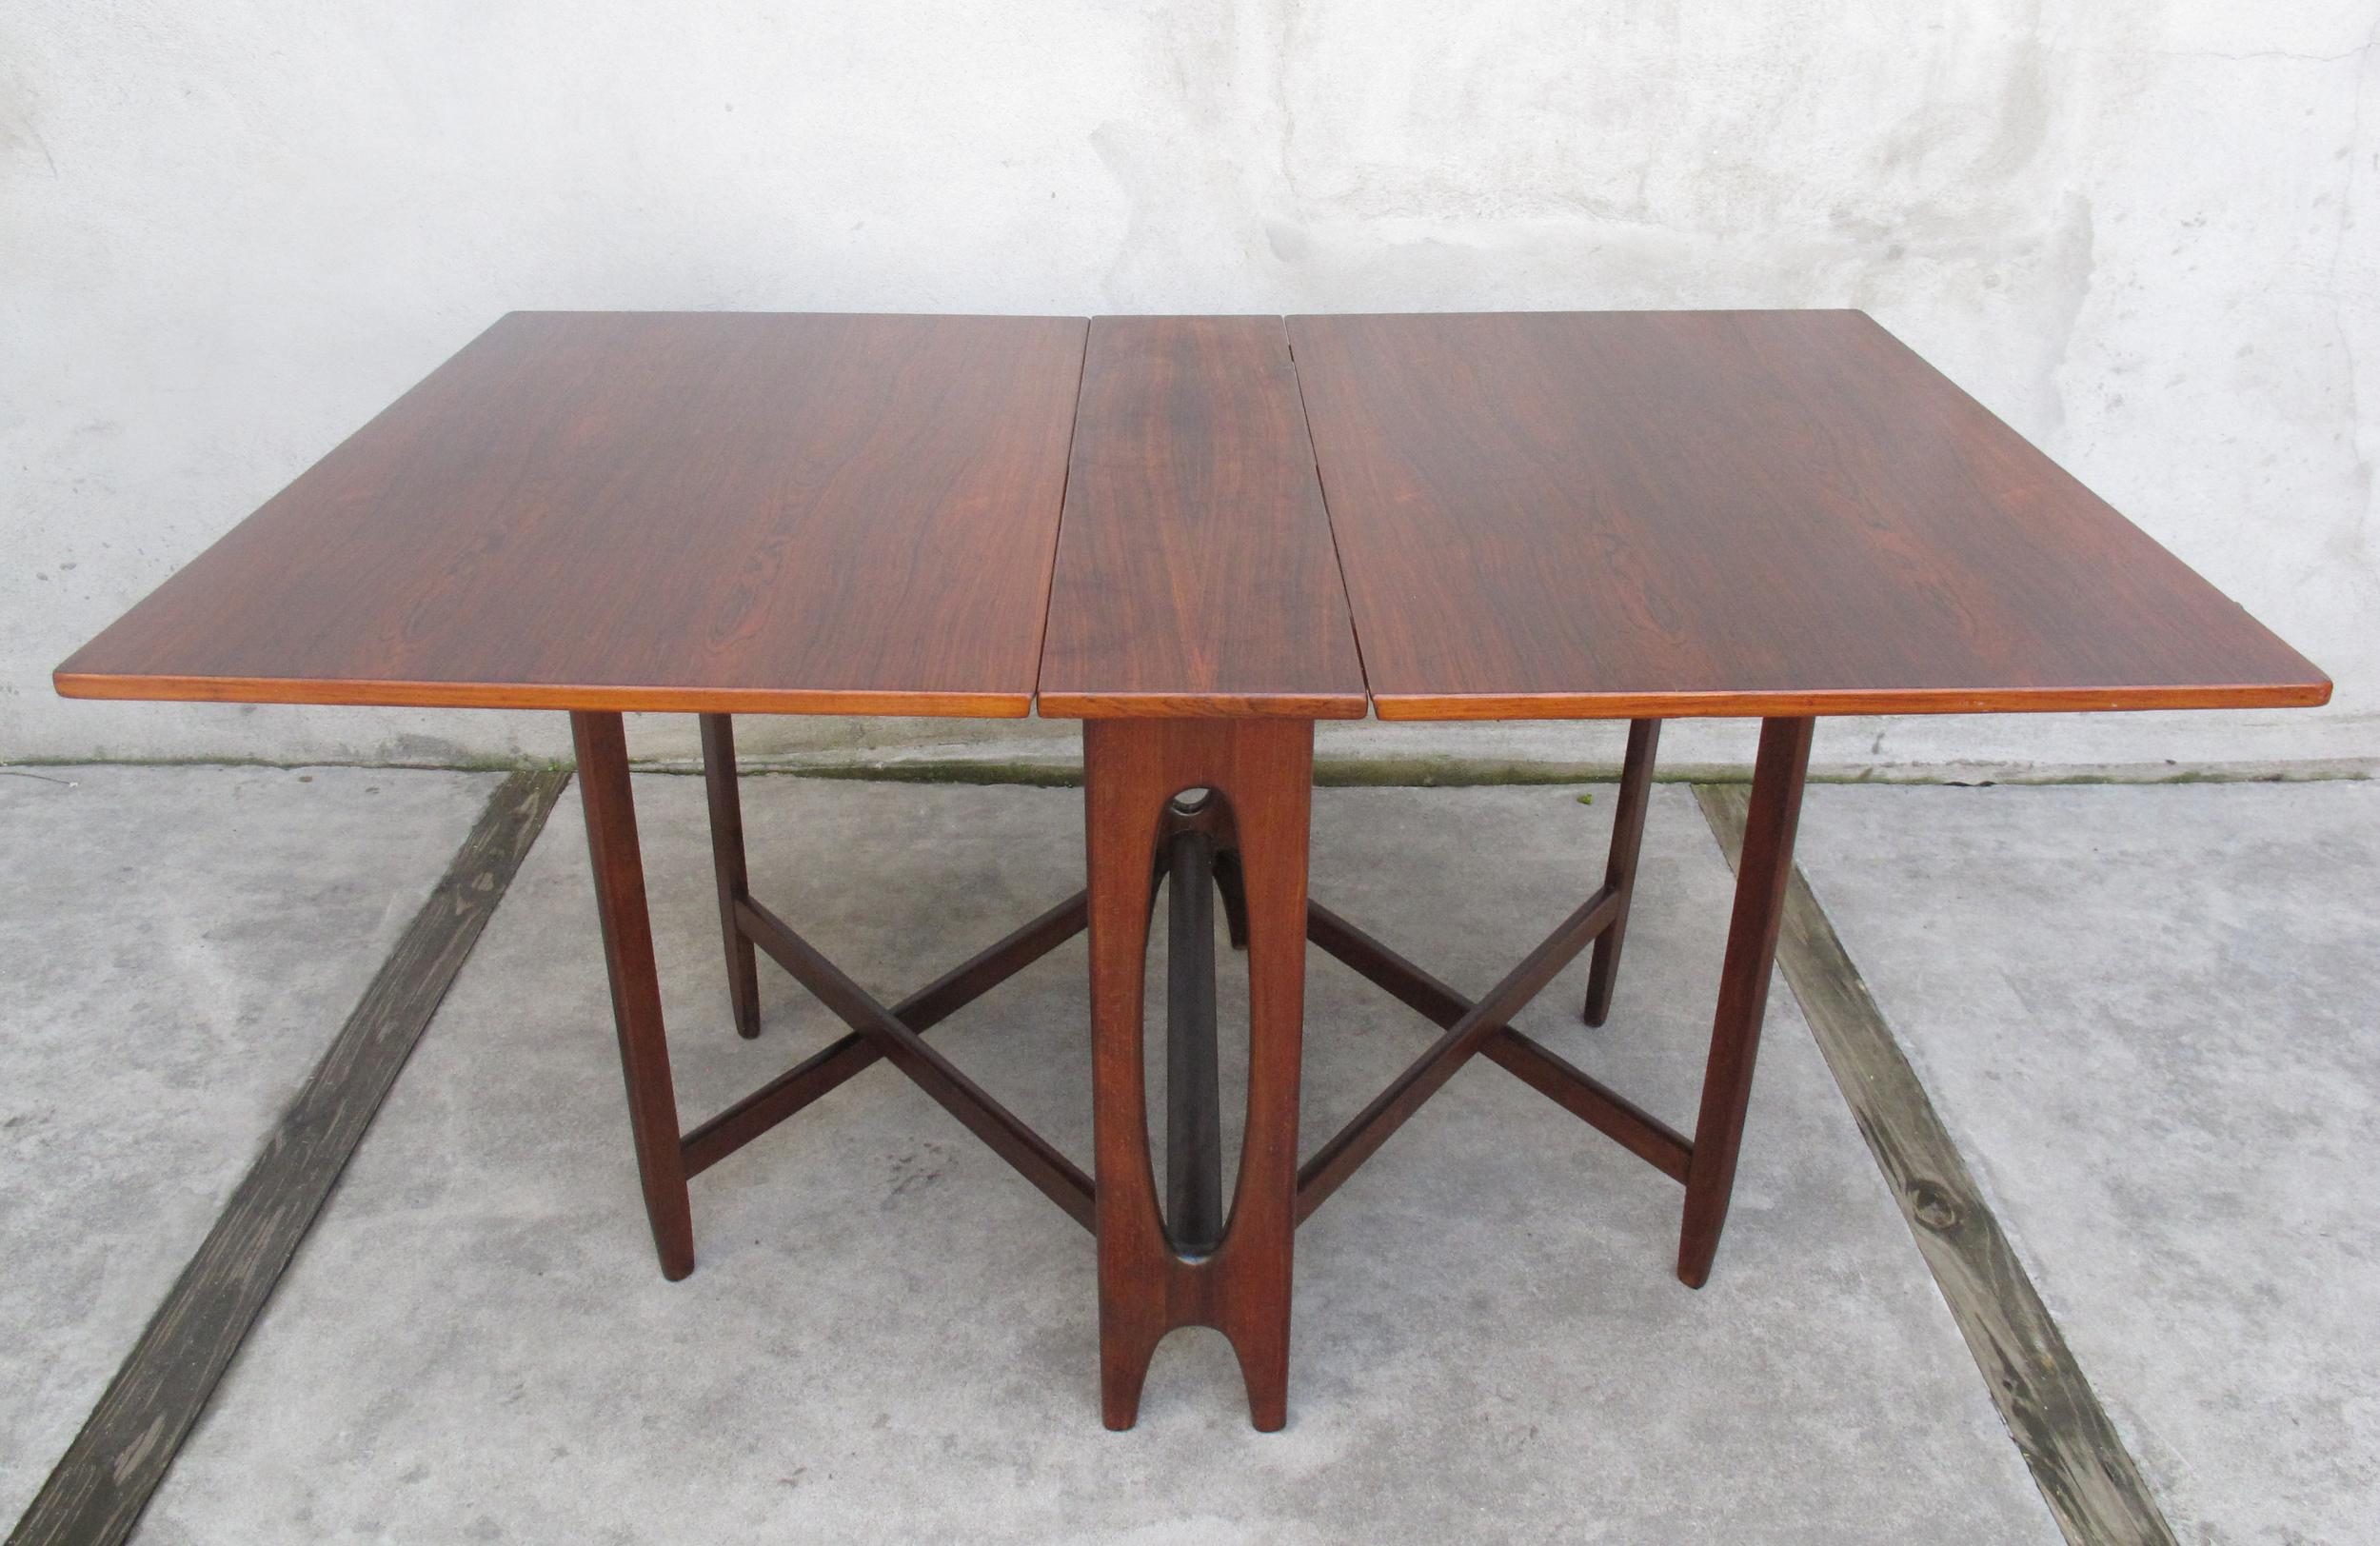 NORWEGIAN DINING TABLE BY BENDT WINGE FOR KLEPPES